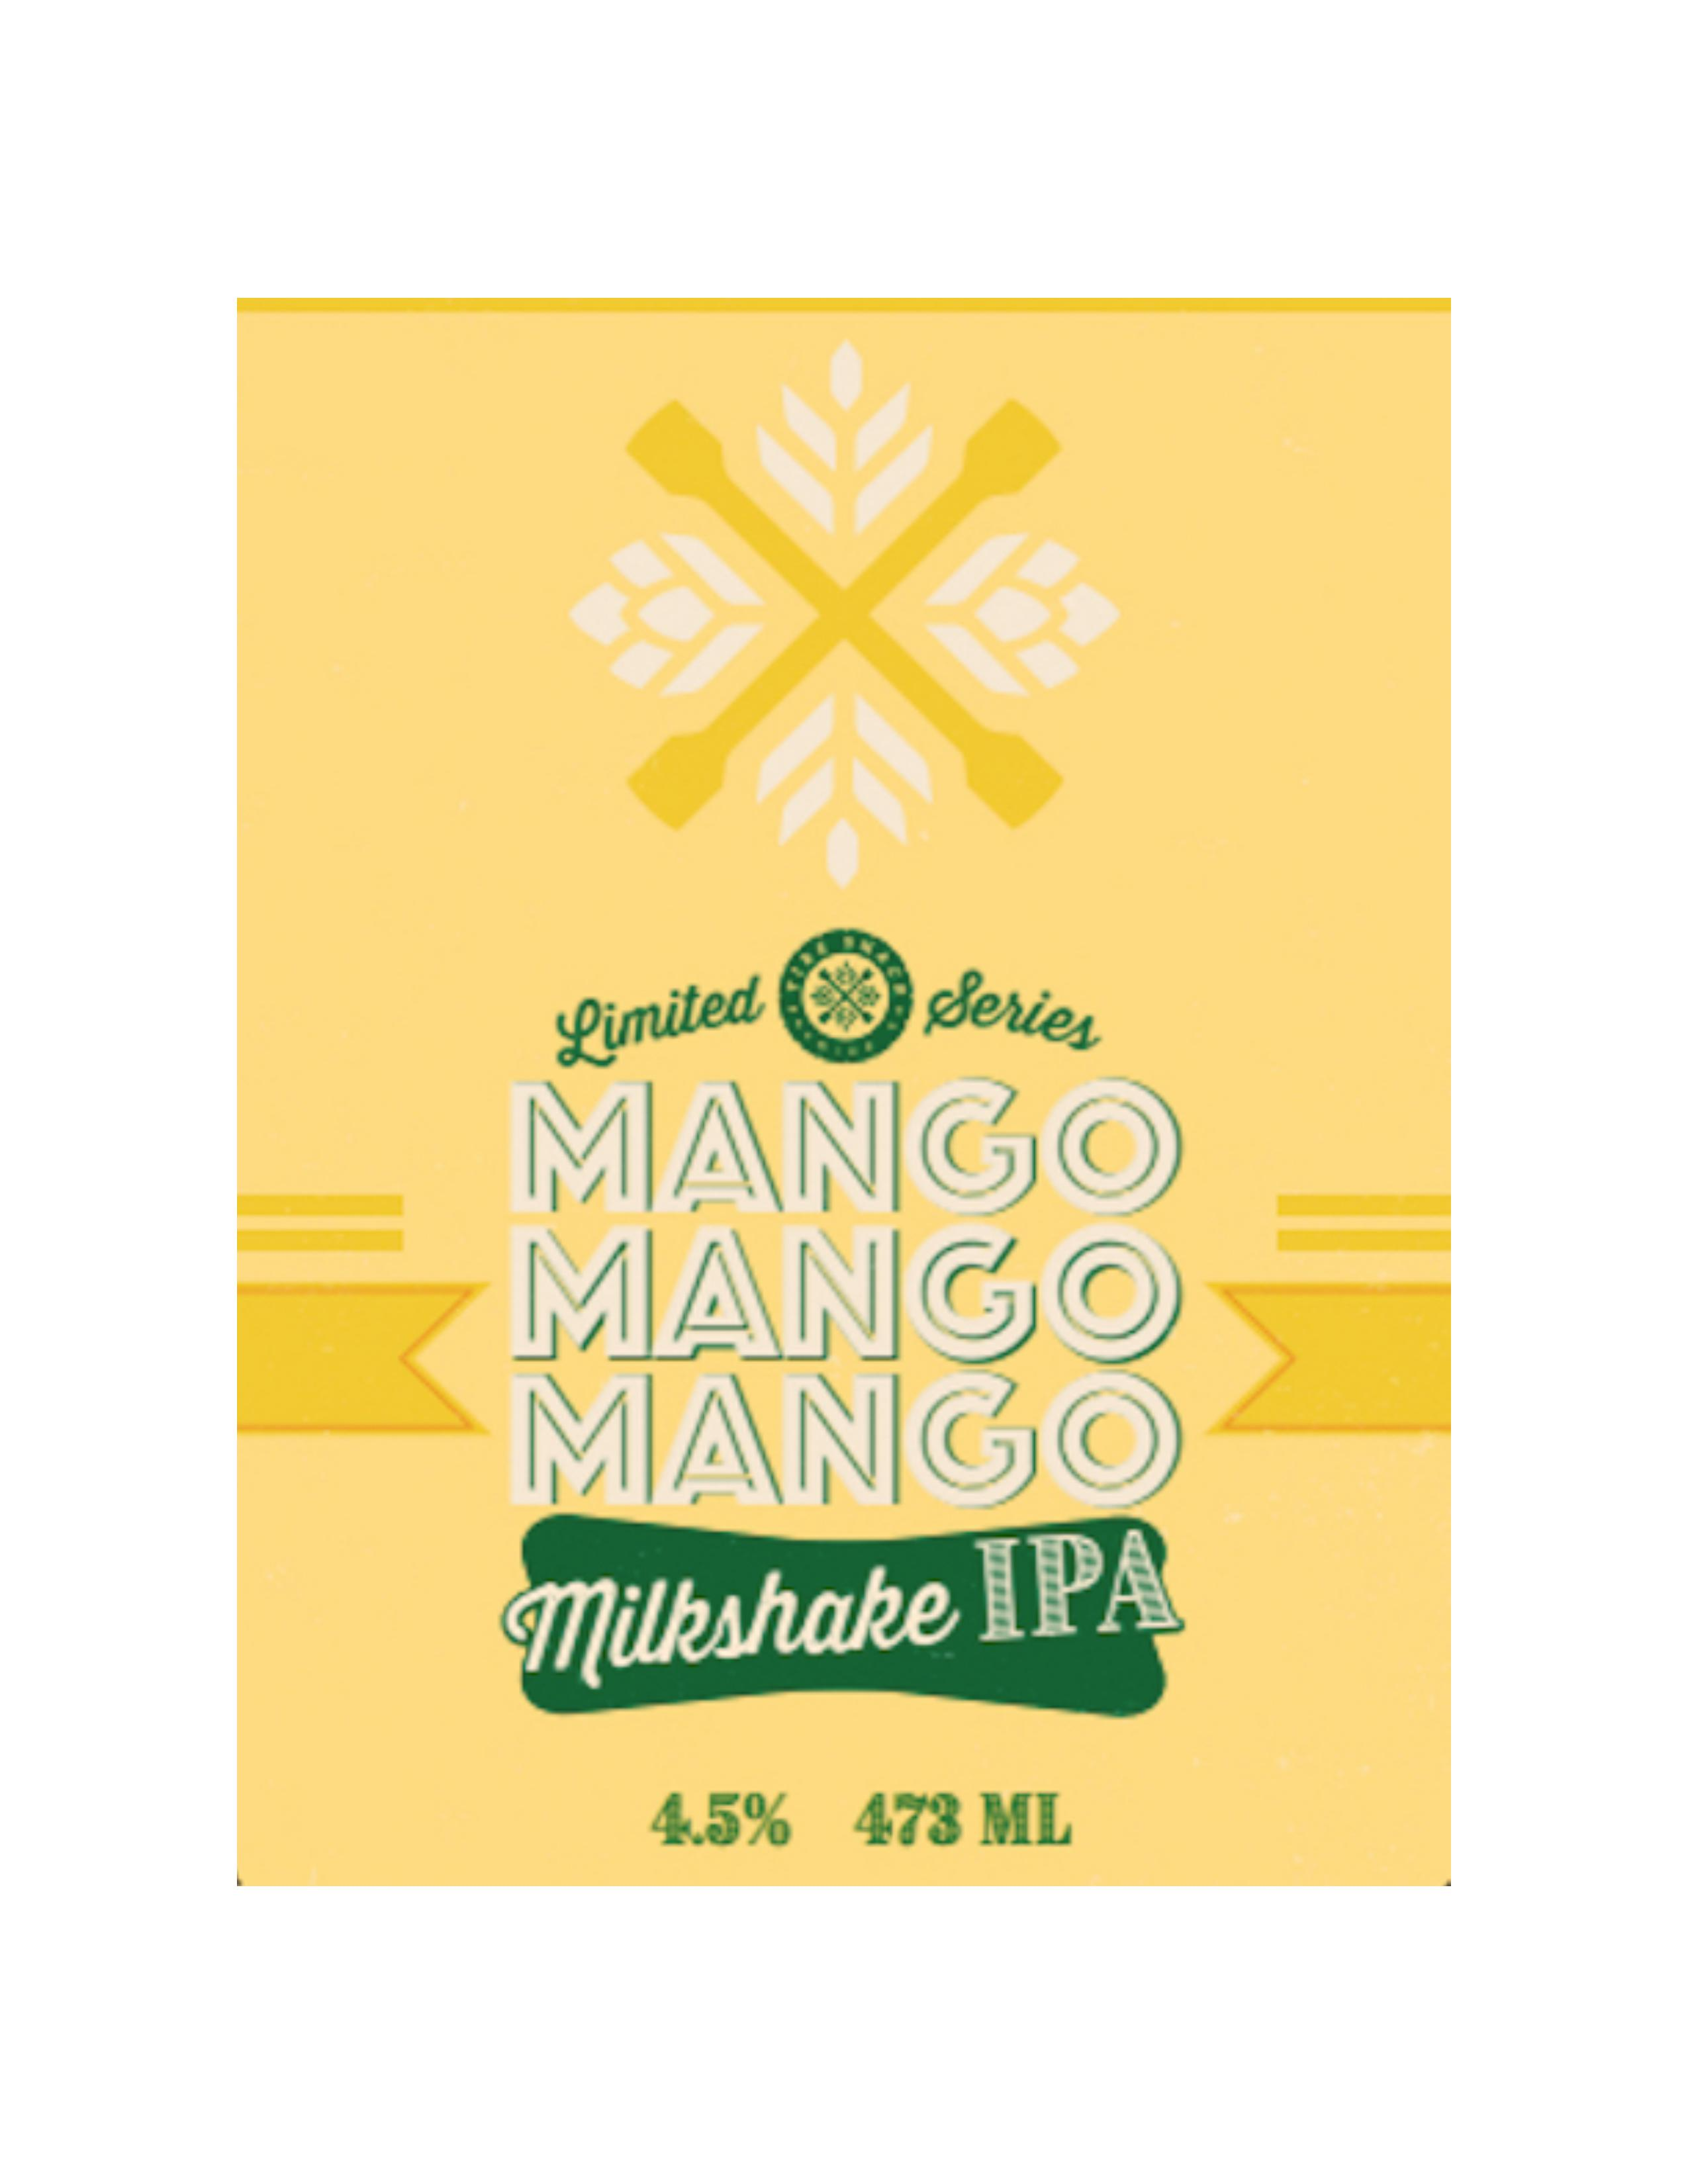 Mango Vanilla Milkshake IPA